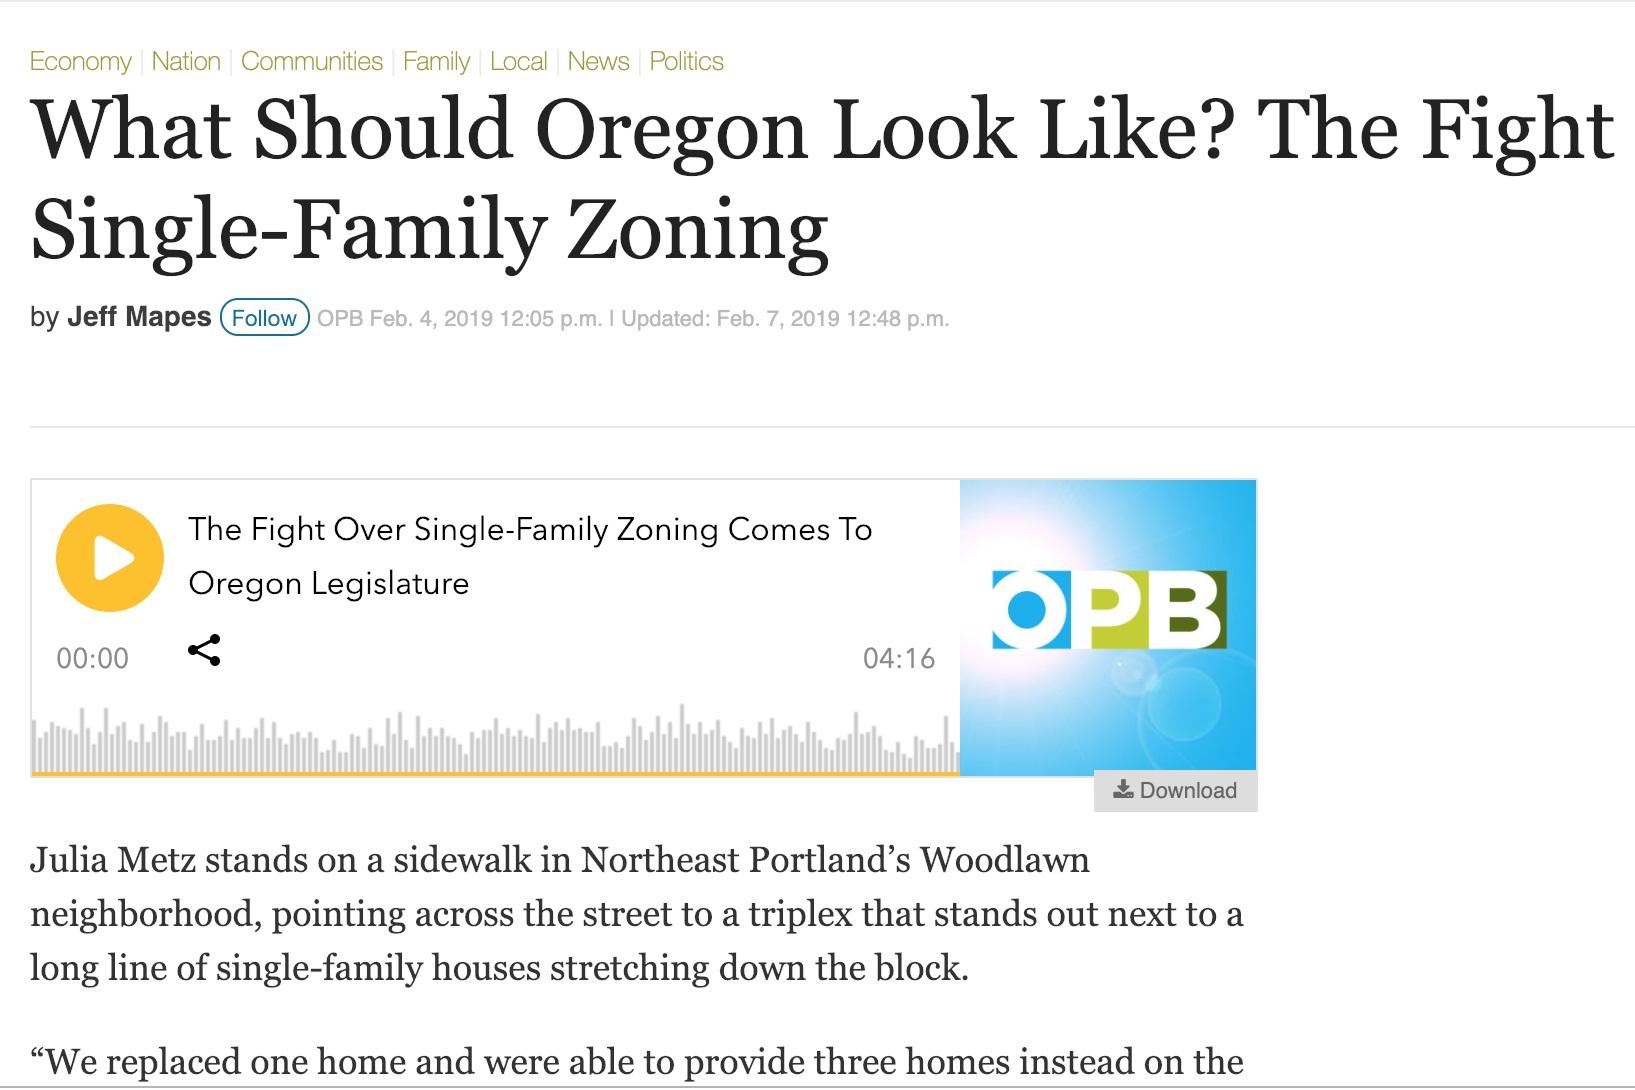 opb_fight_over_zoning.jpg